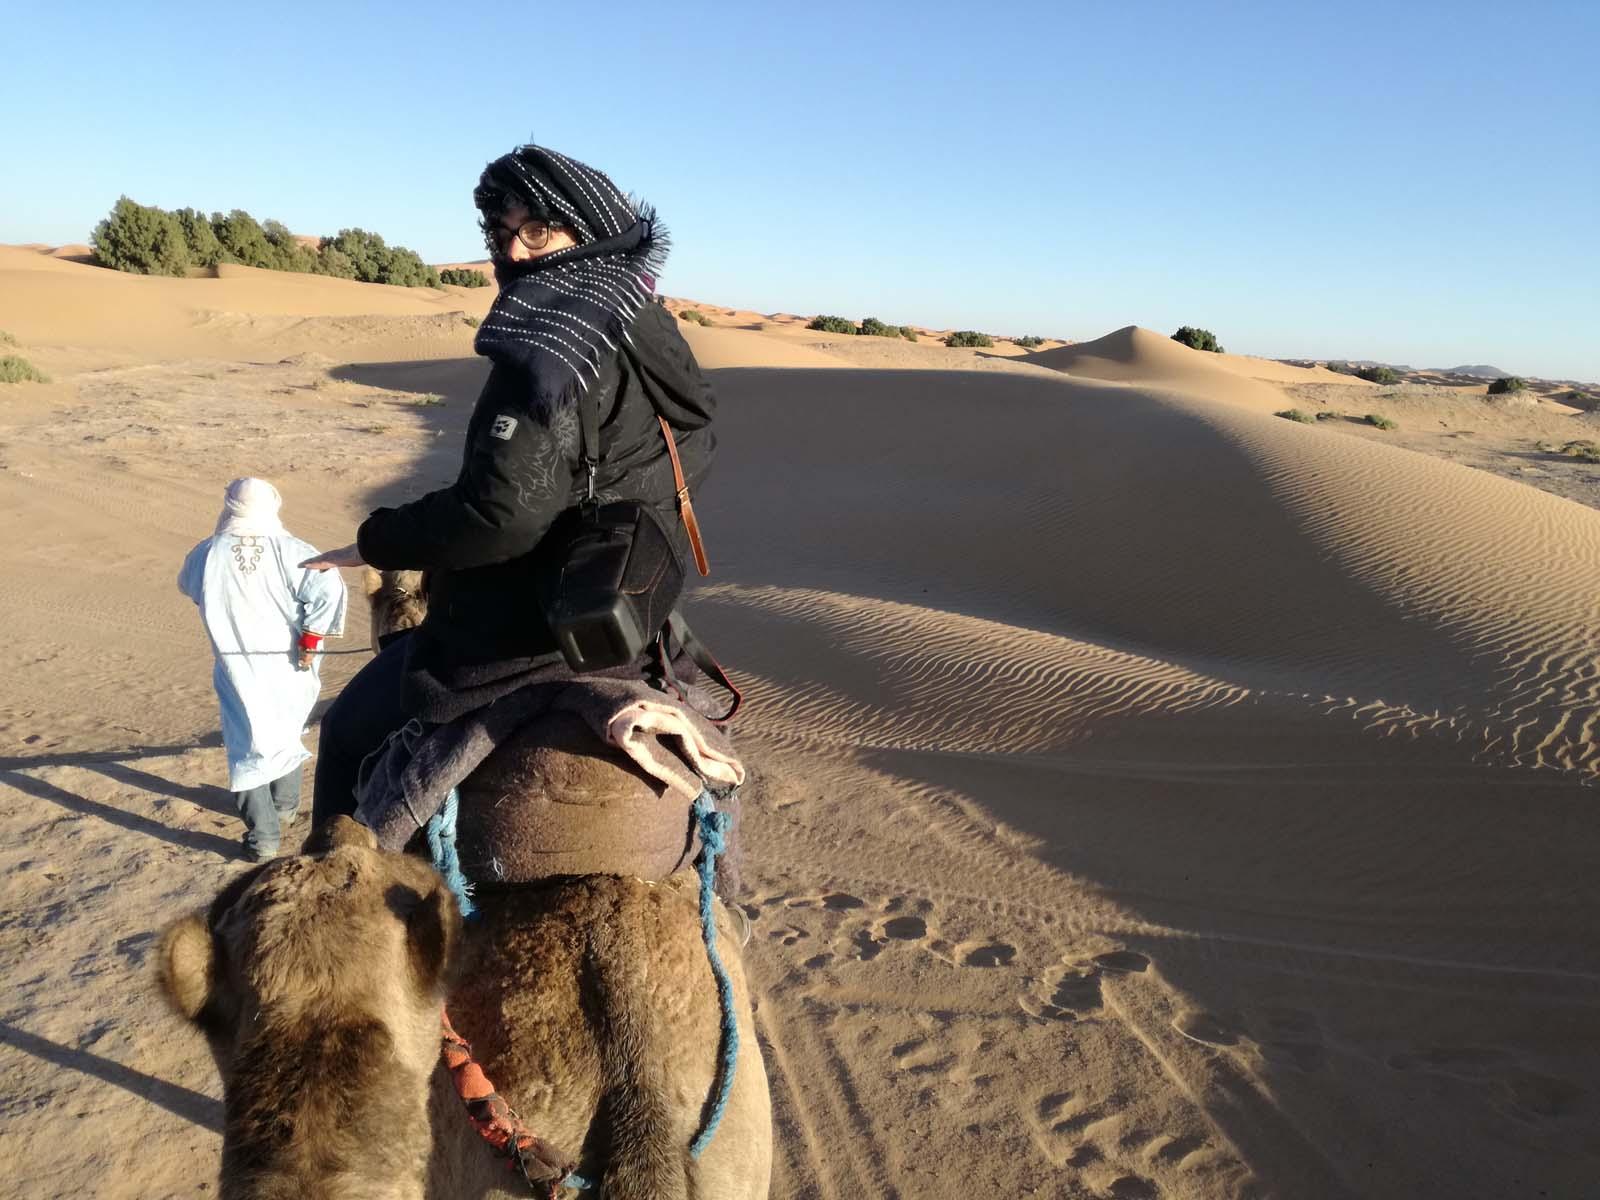 Marianna su un dromedario a Merzouga nel deserto del Sahara